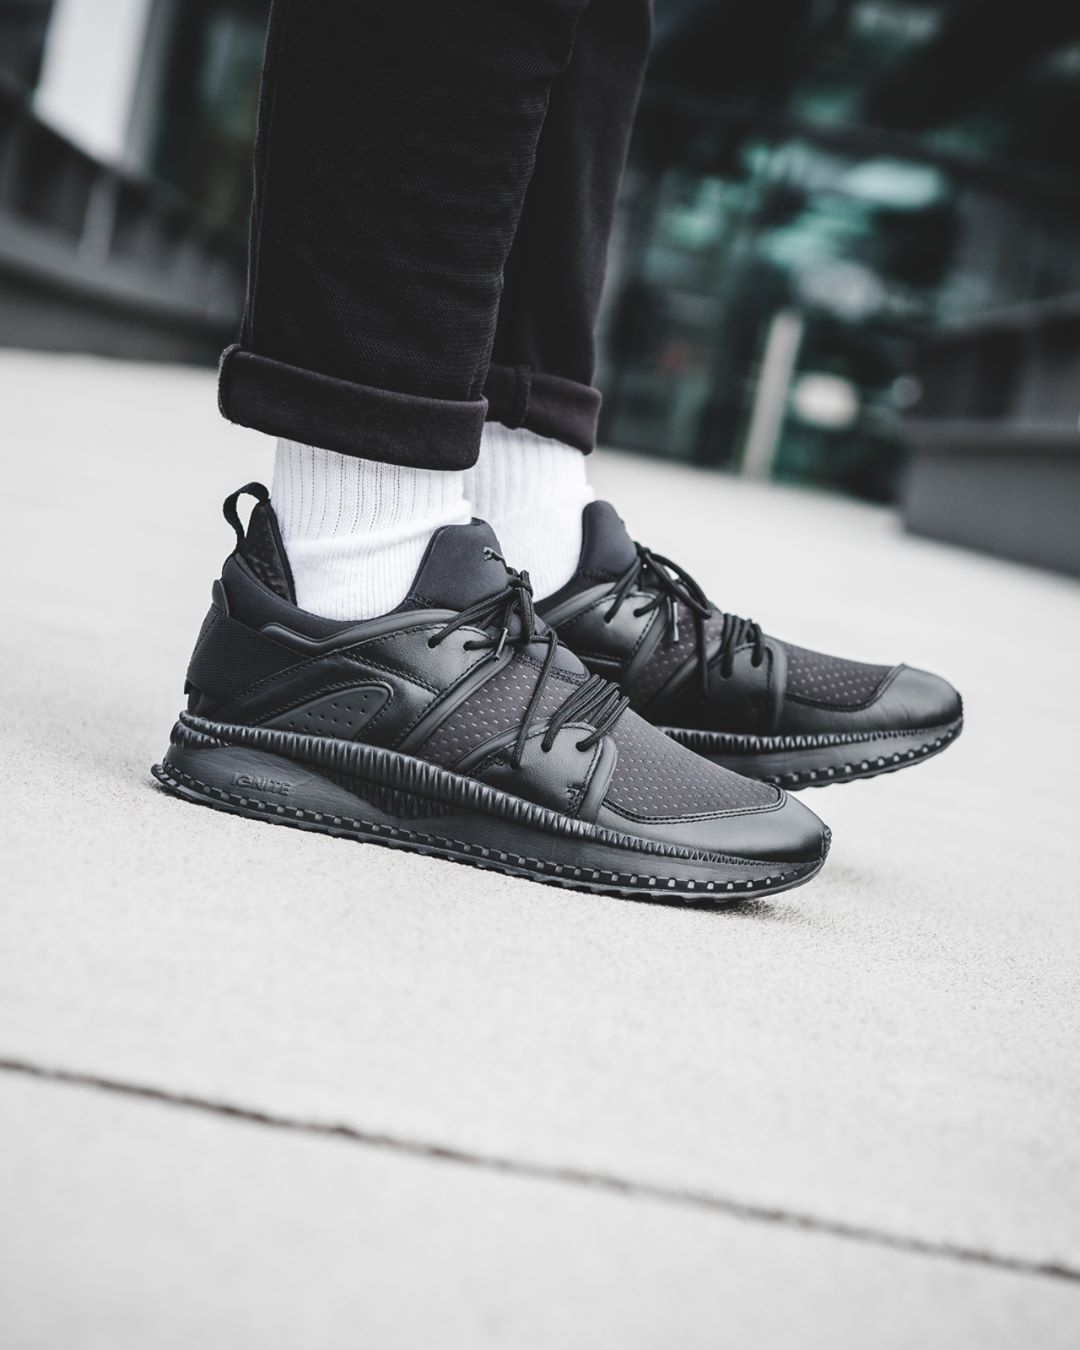 24fb52a71d4a7 Puma Tsugi Blaze Meta: Black | Sneakers: Puma Tsugi | Sneakers ...